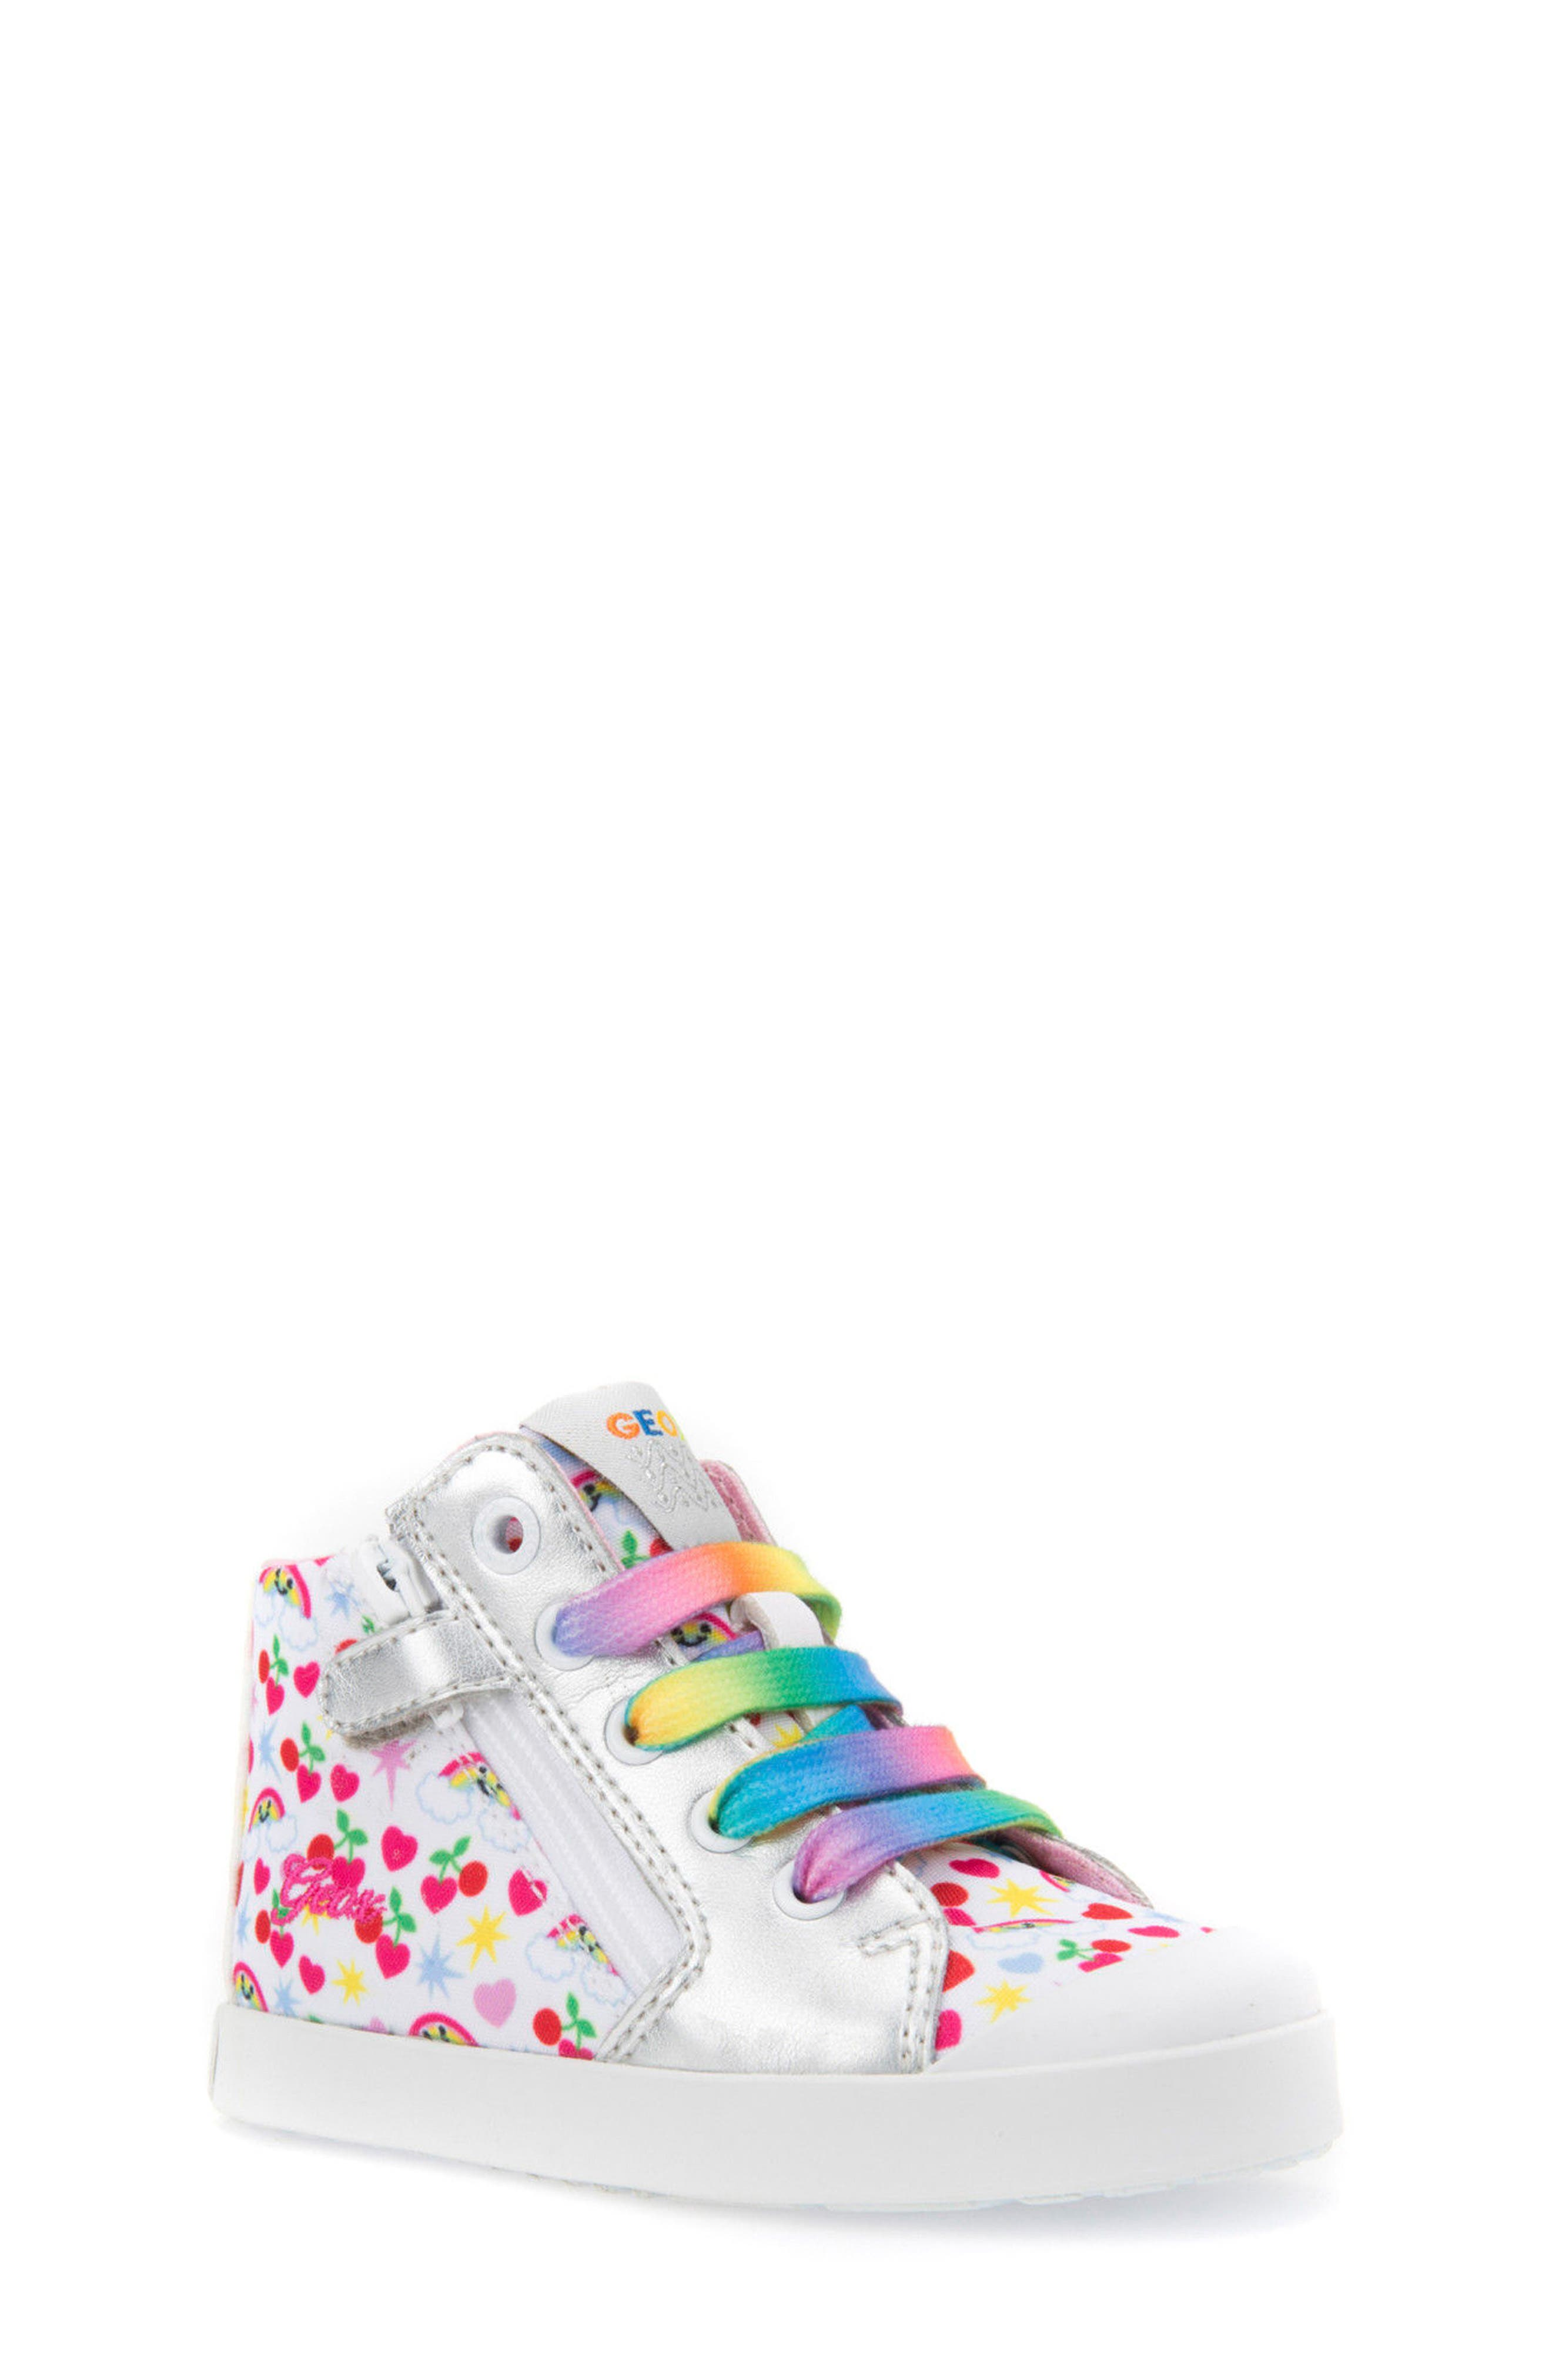 Geox Kilwi Patterned High Top Sneaker (Walker & Toddler)